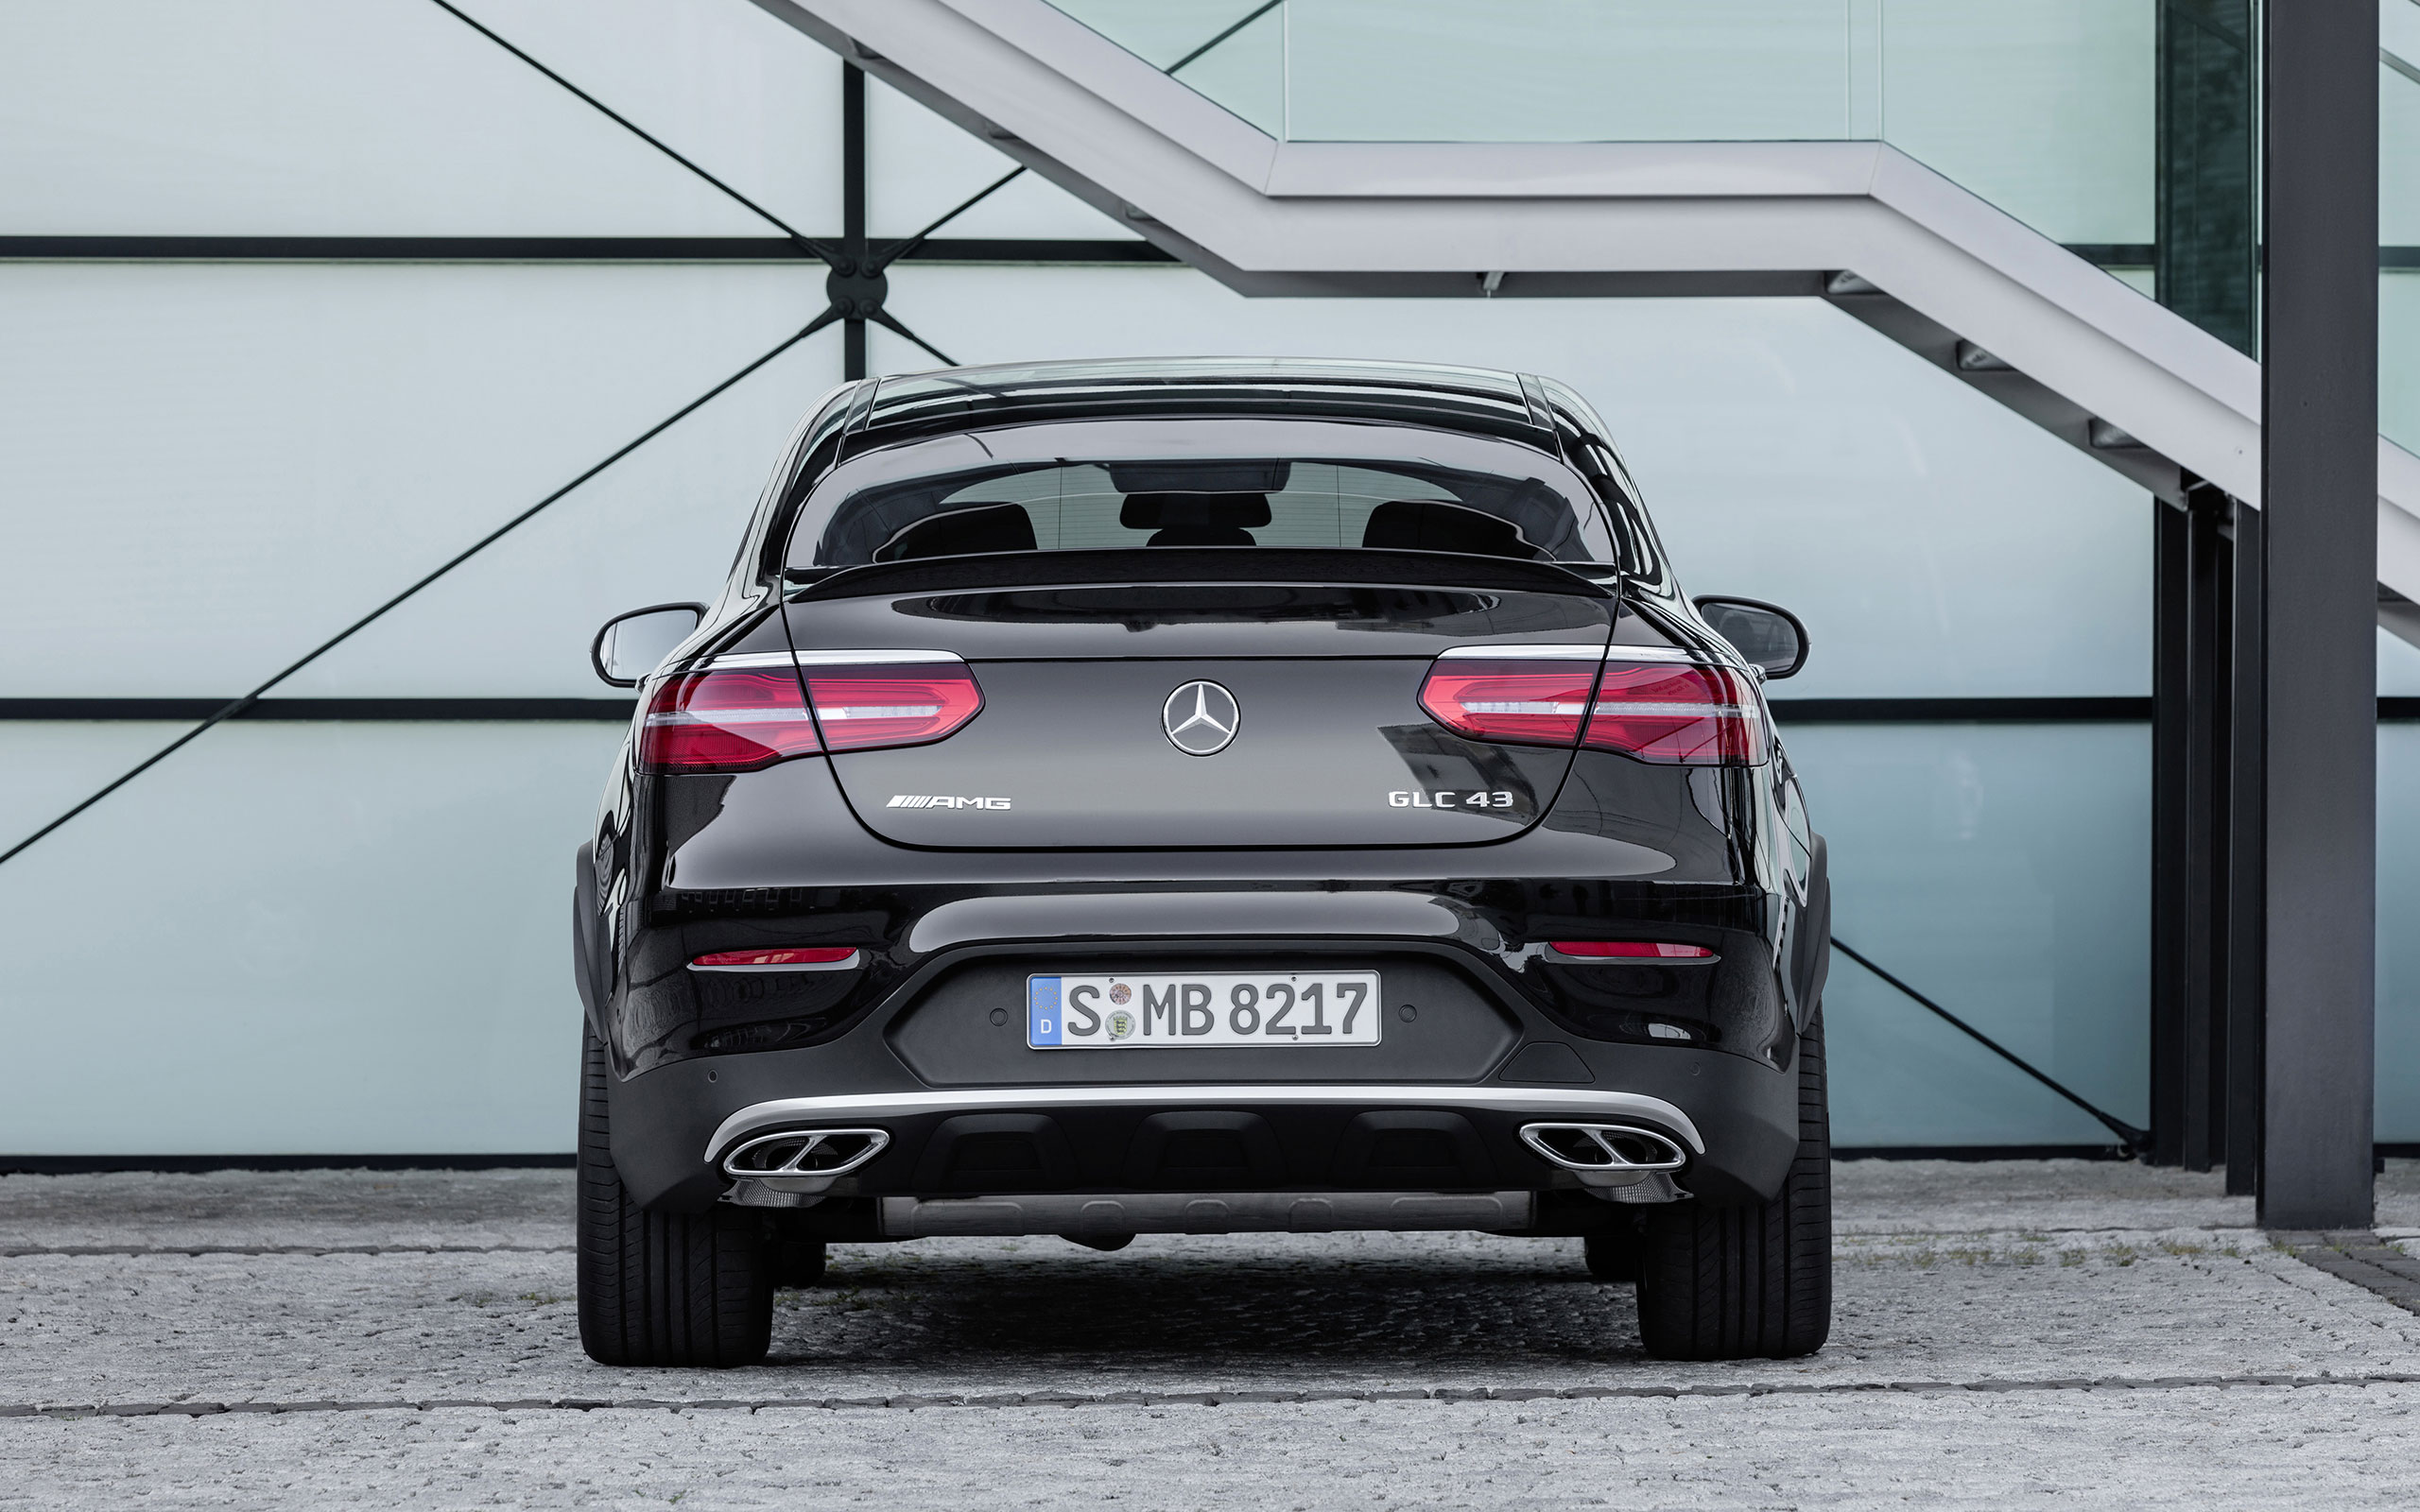 Mercedes-Benz - Home of C, E, S, CLS, CL, SLK, SL, R, GLK, M, GL, G ...